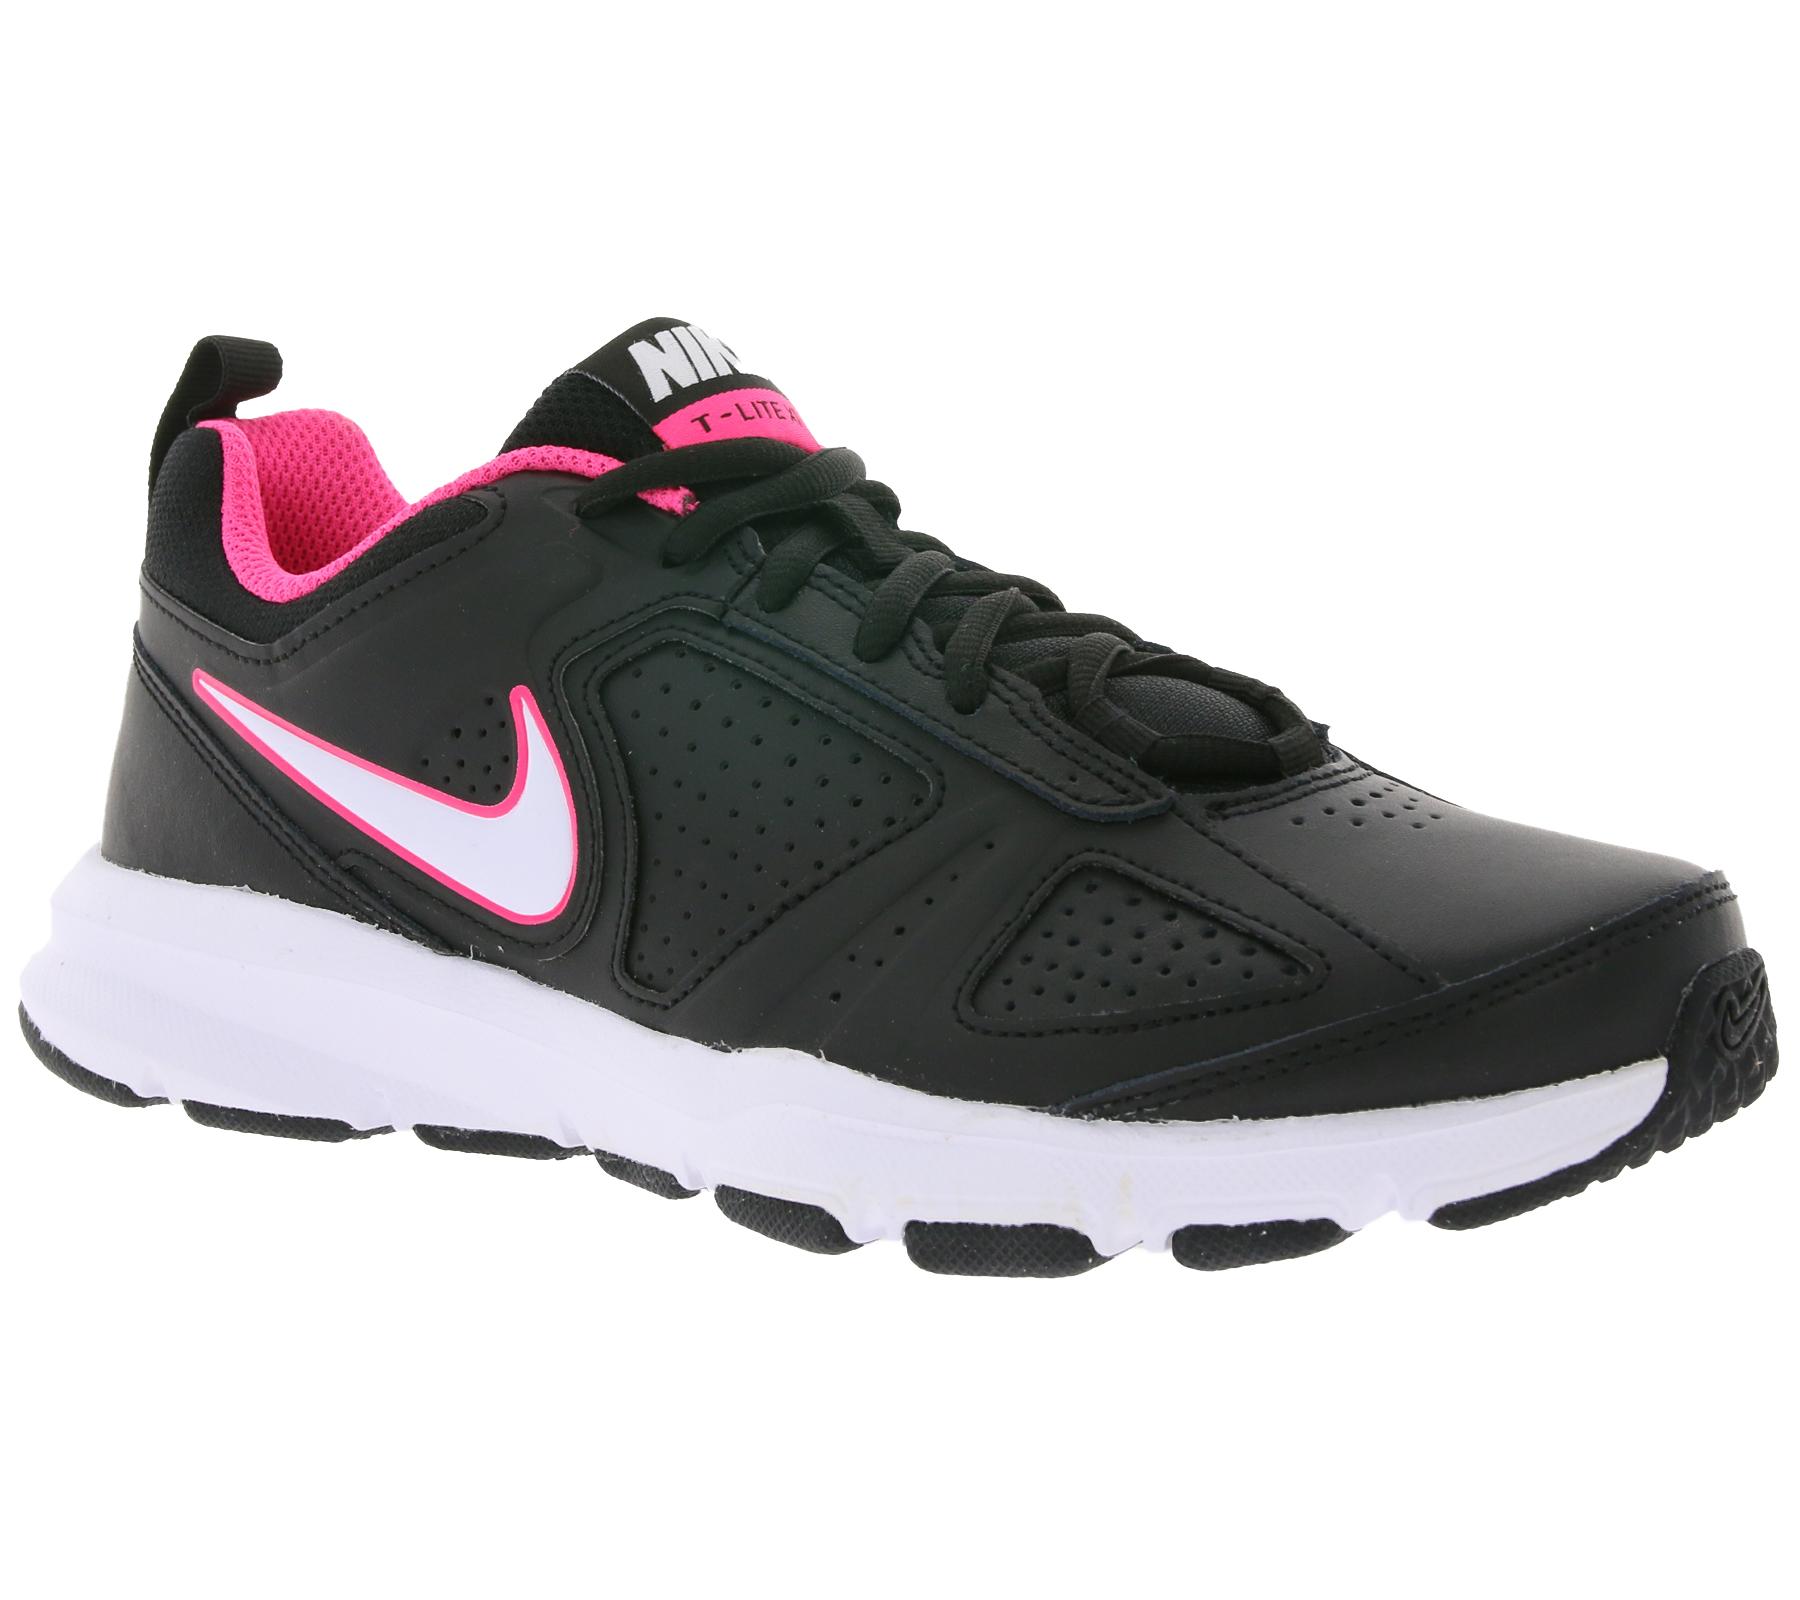 Details zu NIKE Schuhe klassische Damen Laufschuhe Sportschuhe T-Lite XI  Fitness Schwarz